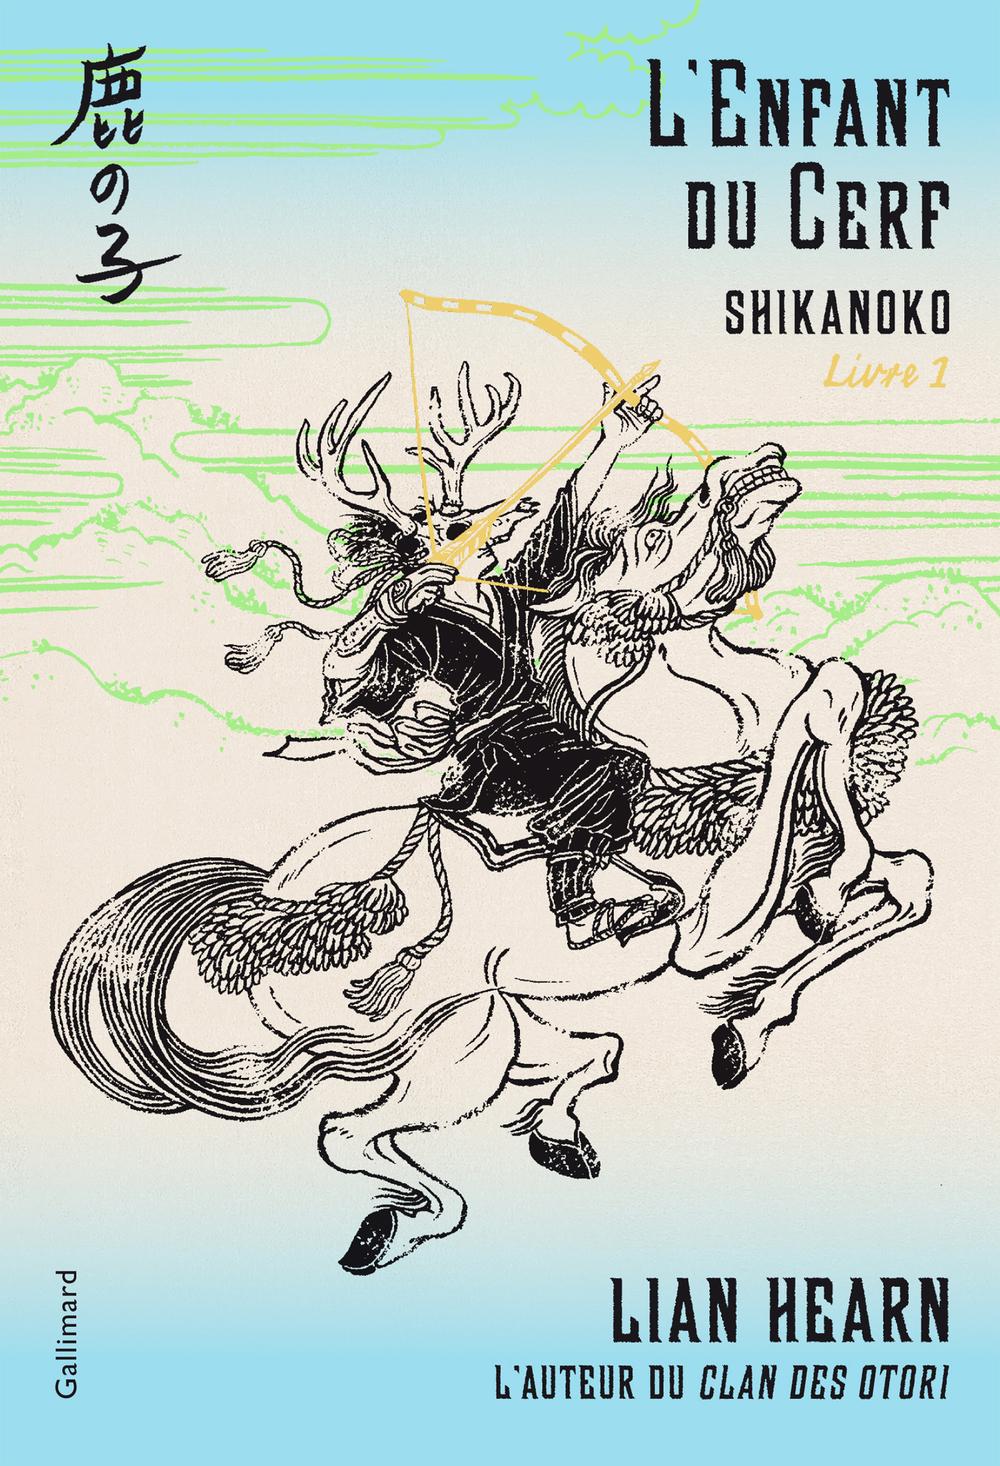 Shikanoko (Livre 1) - L'Enfant du Cerf |